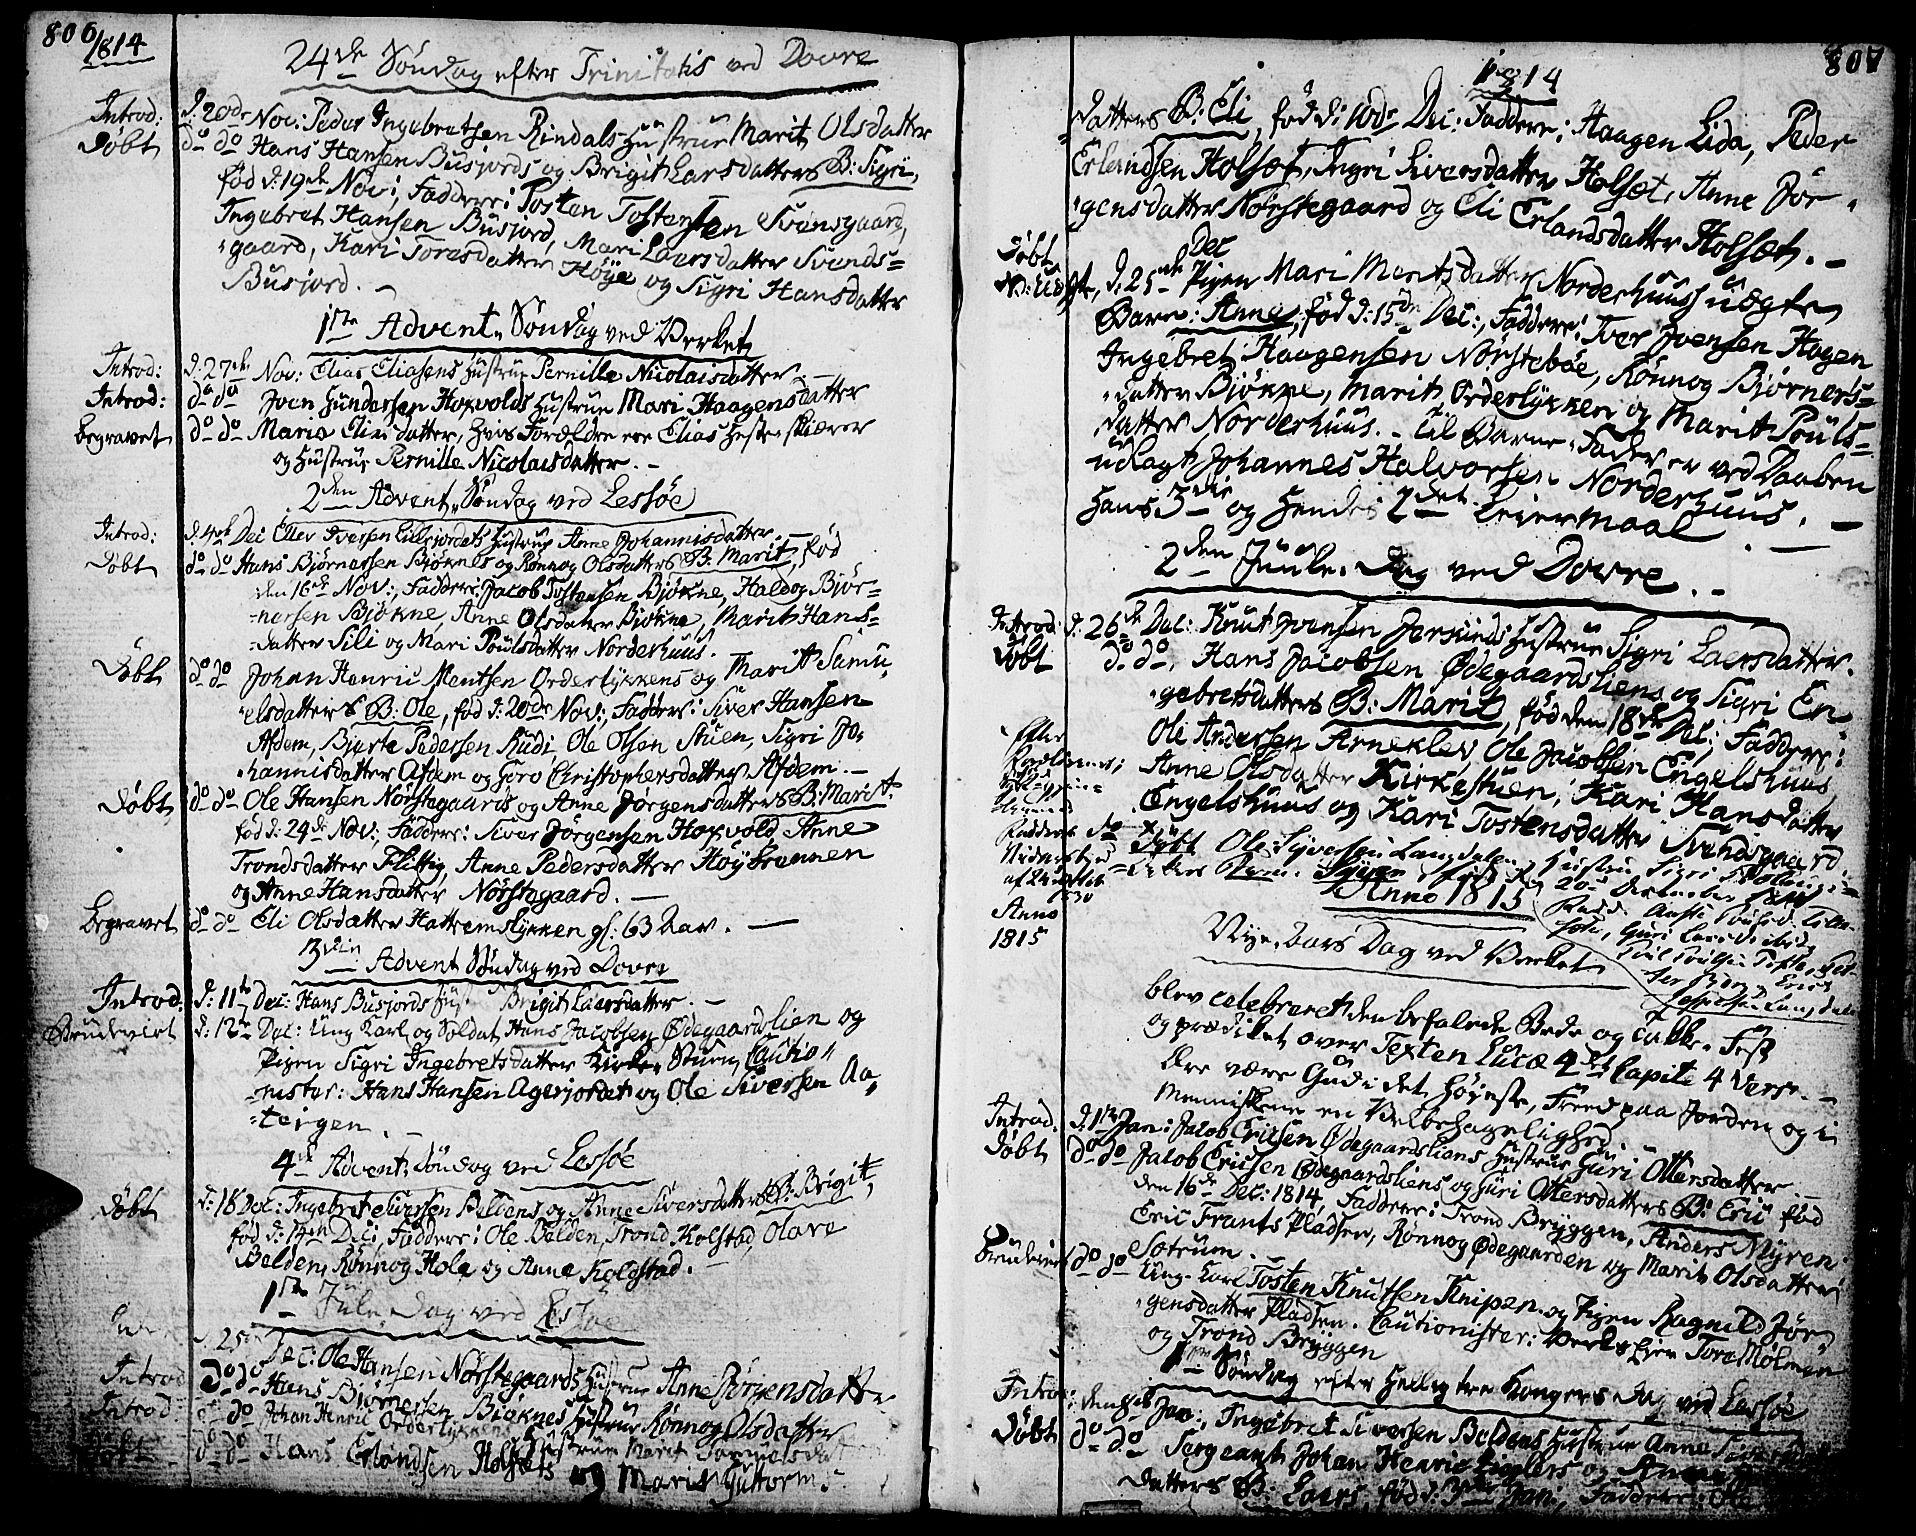 SAH, Lesja prestekontor, Ministerialbok nr. 3, 1777-1819, s. 806-807